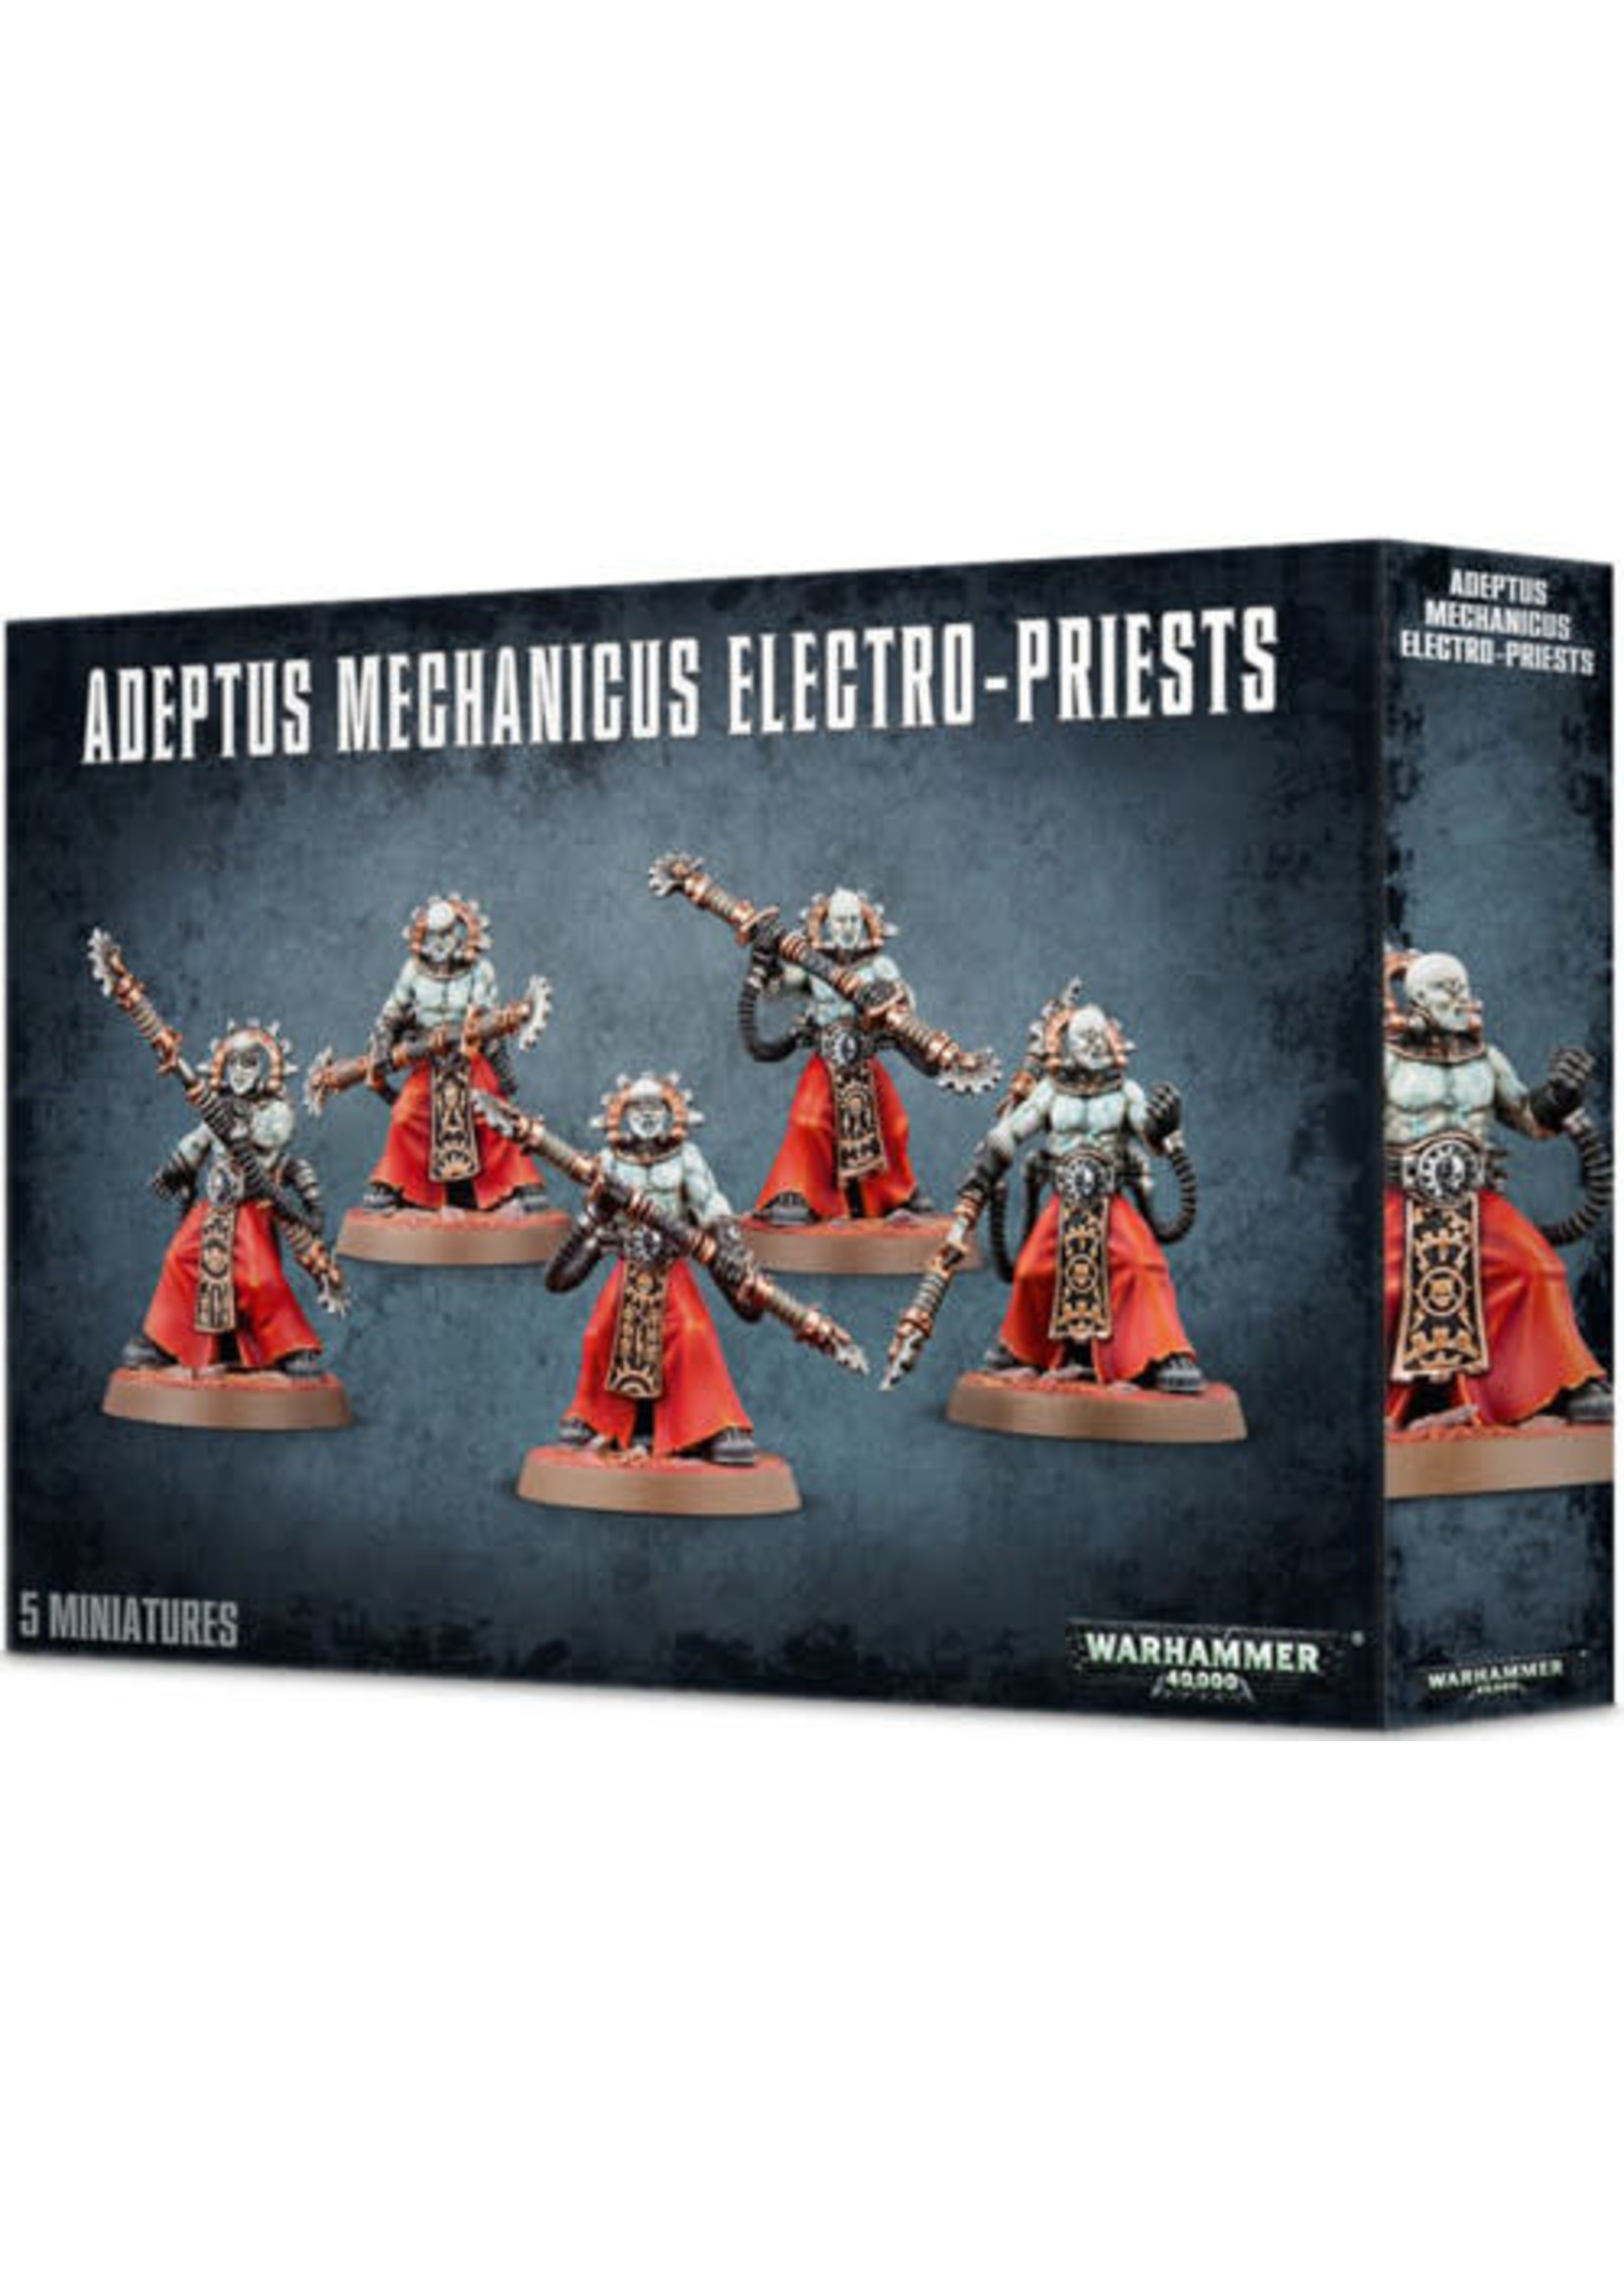 Adeptus Mechanicus Electro-Priests (40K)